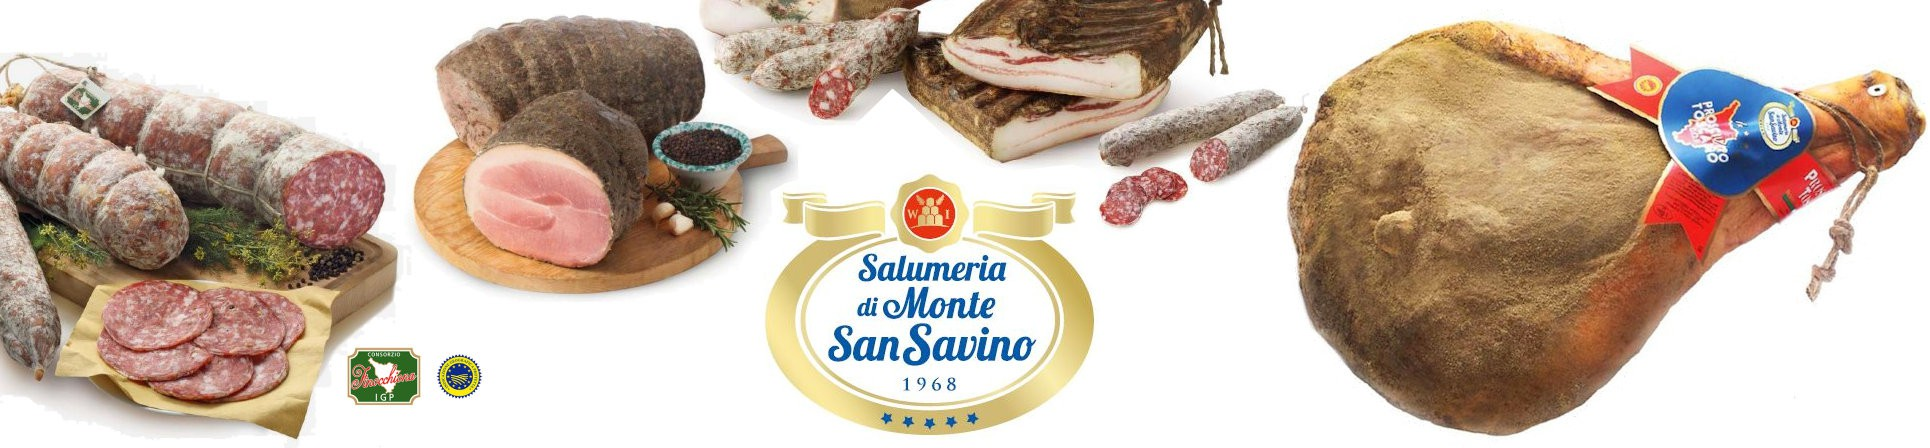 Vendita online Prosciutto Toscano DOP - Salumeria Monte San Savino